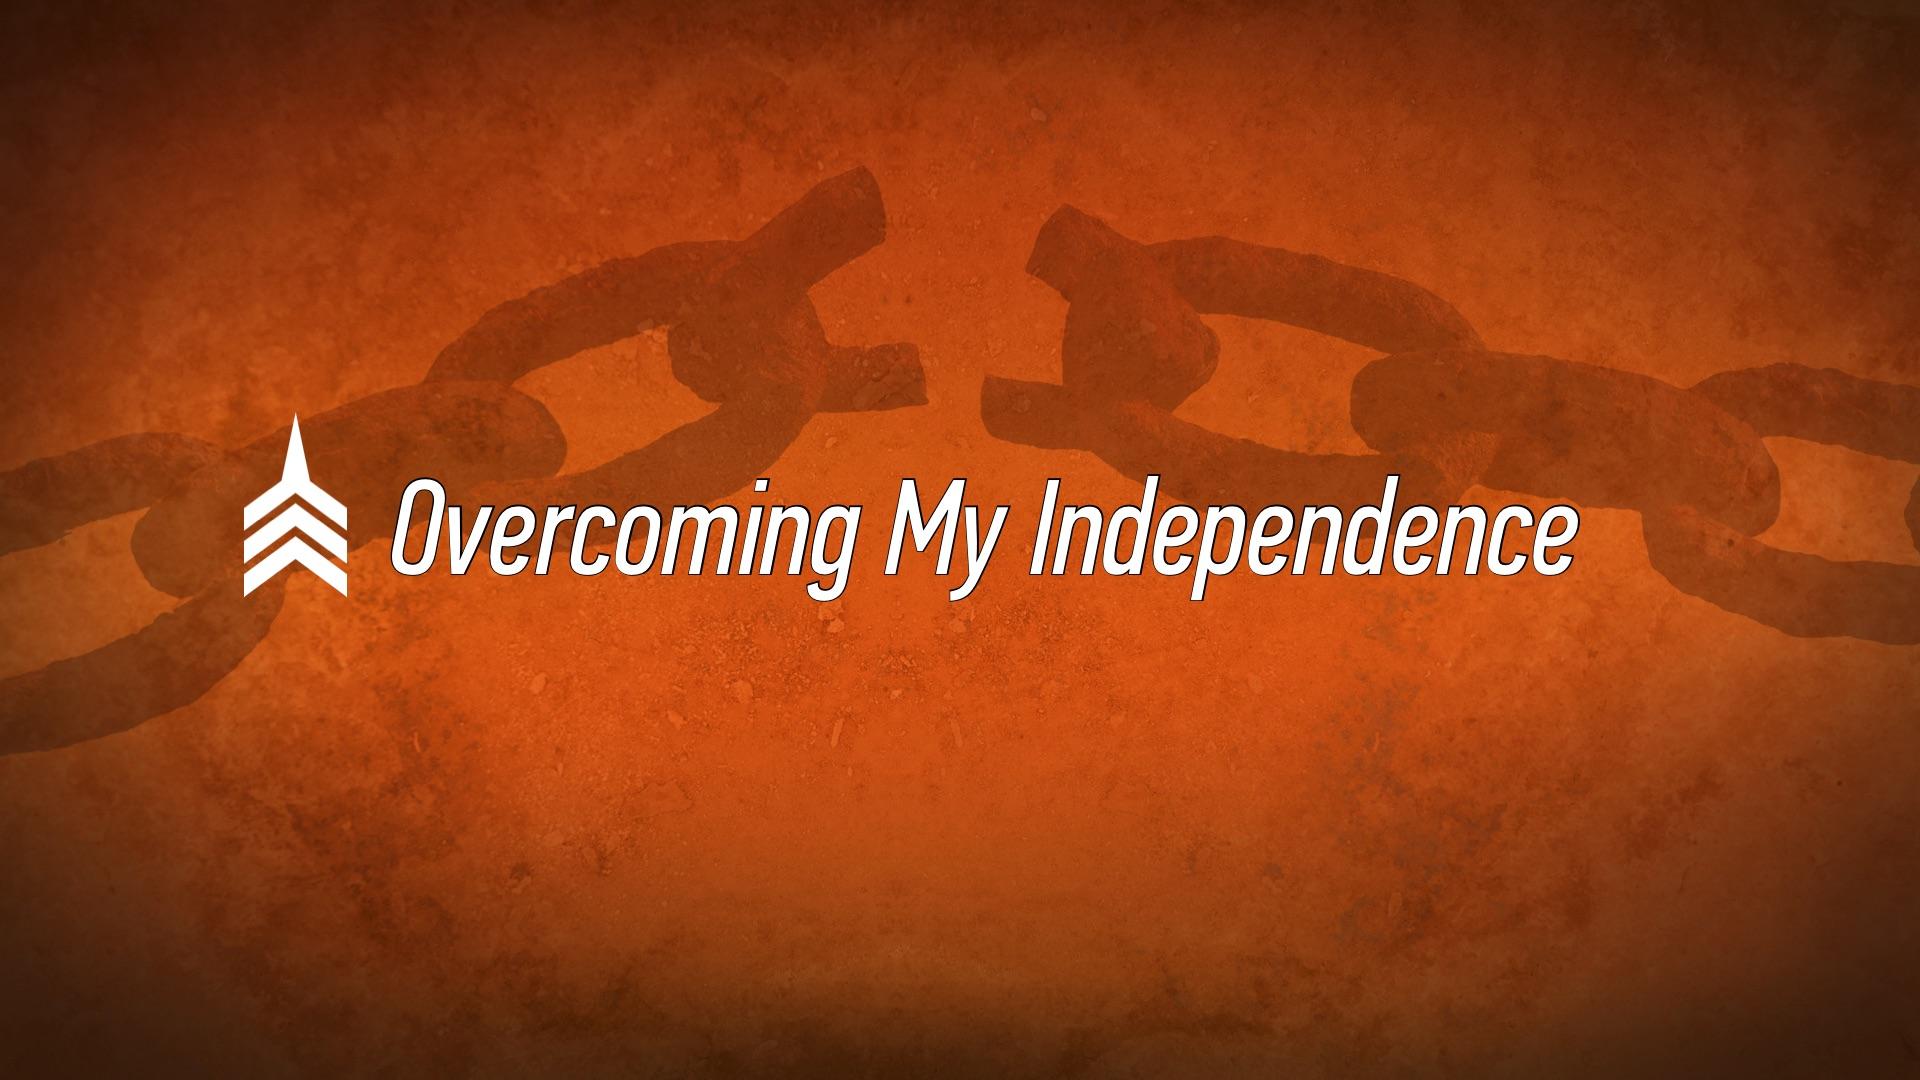 20170730 Overcoming My Independence.jpg